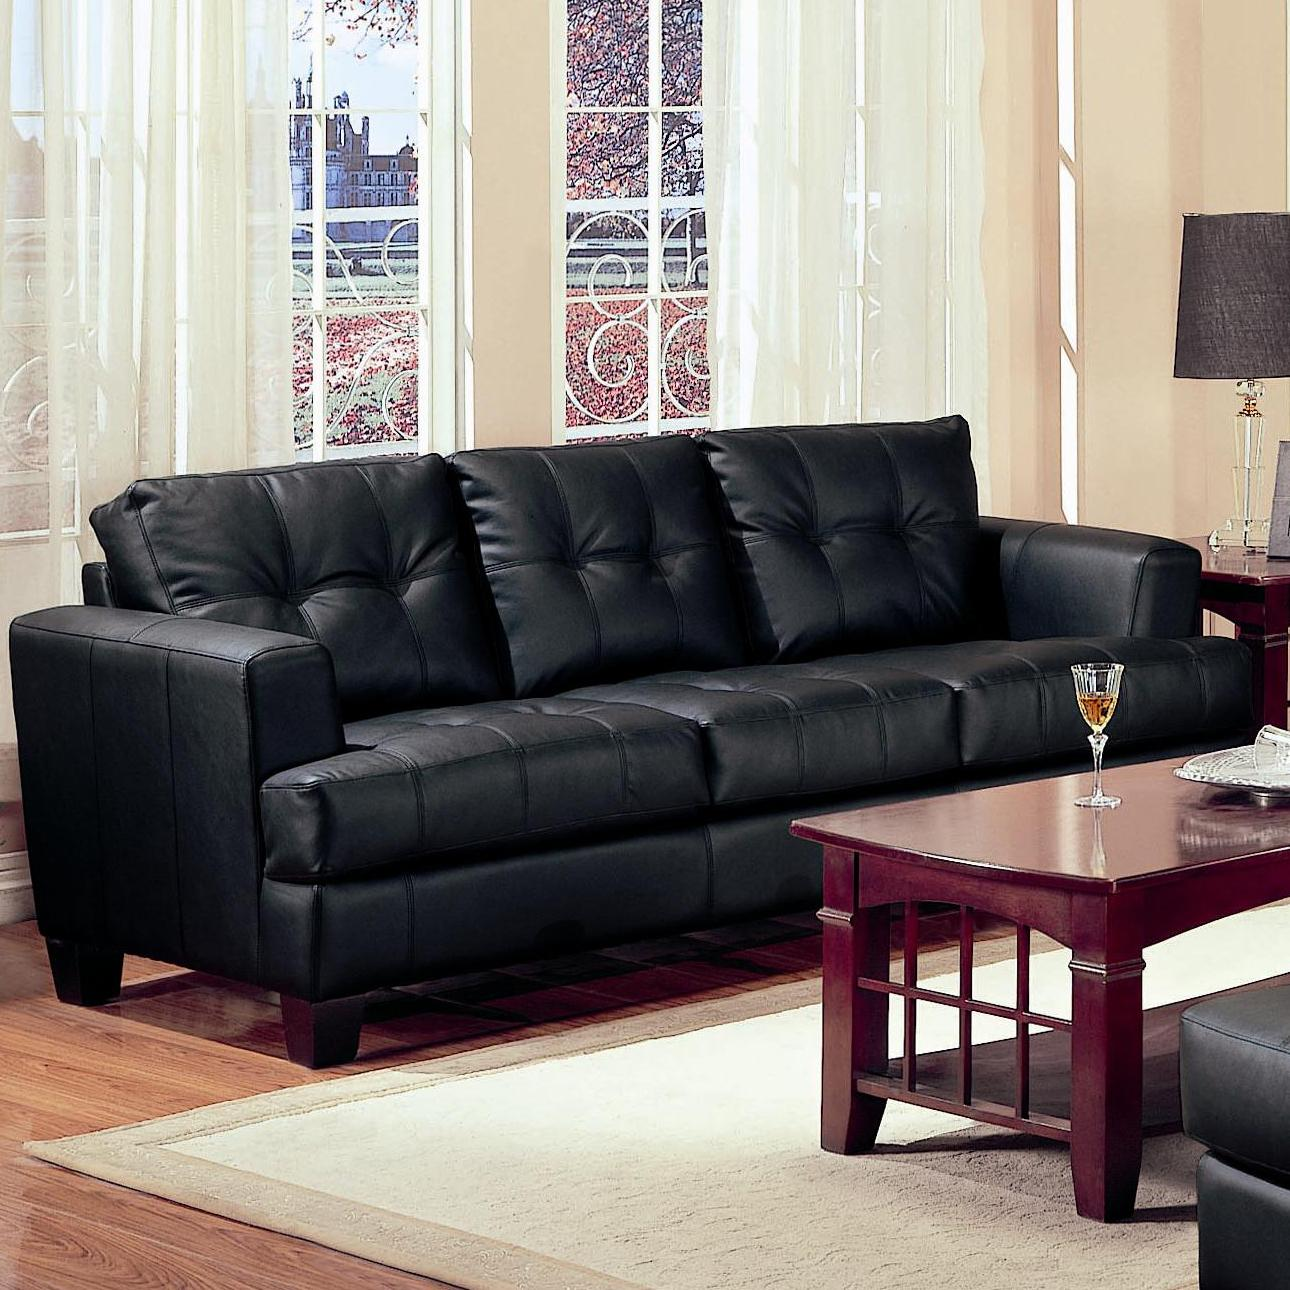 coaster samuel bonded leather sofa folding sofas 2 piece black loveseat and